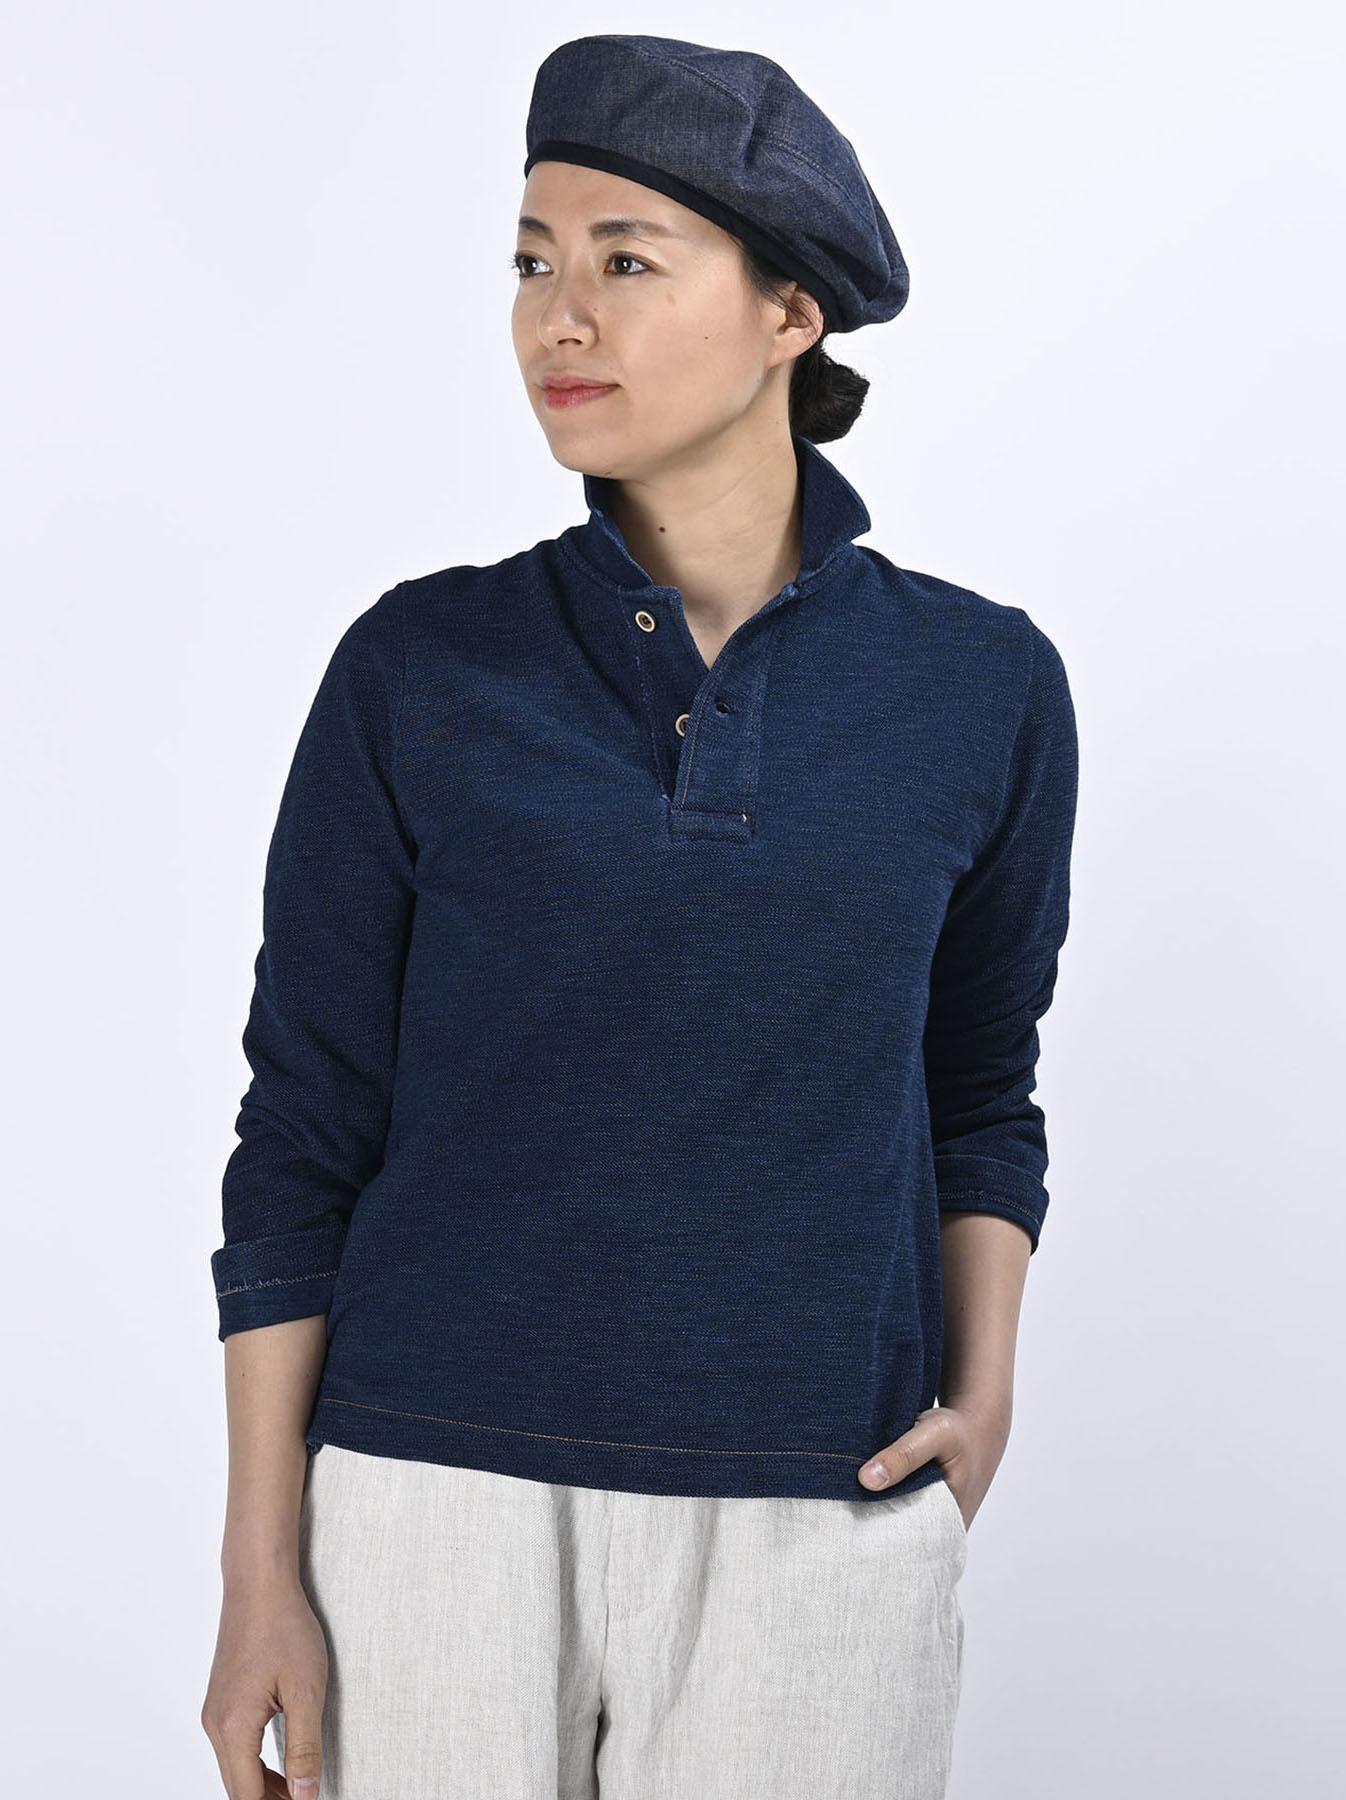 Indigo Kanoko Shiokaze Long-sleeved Square Polo Shirt (0521)-3